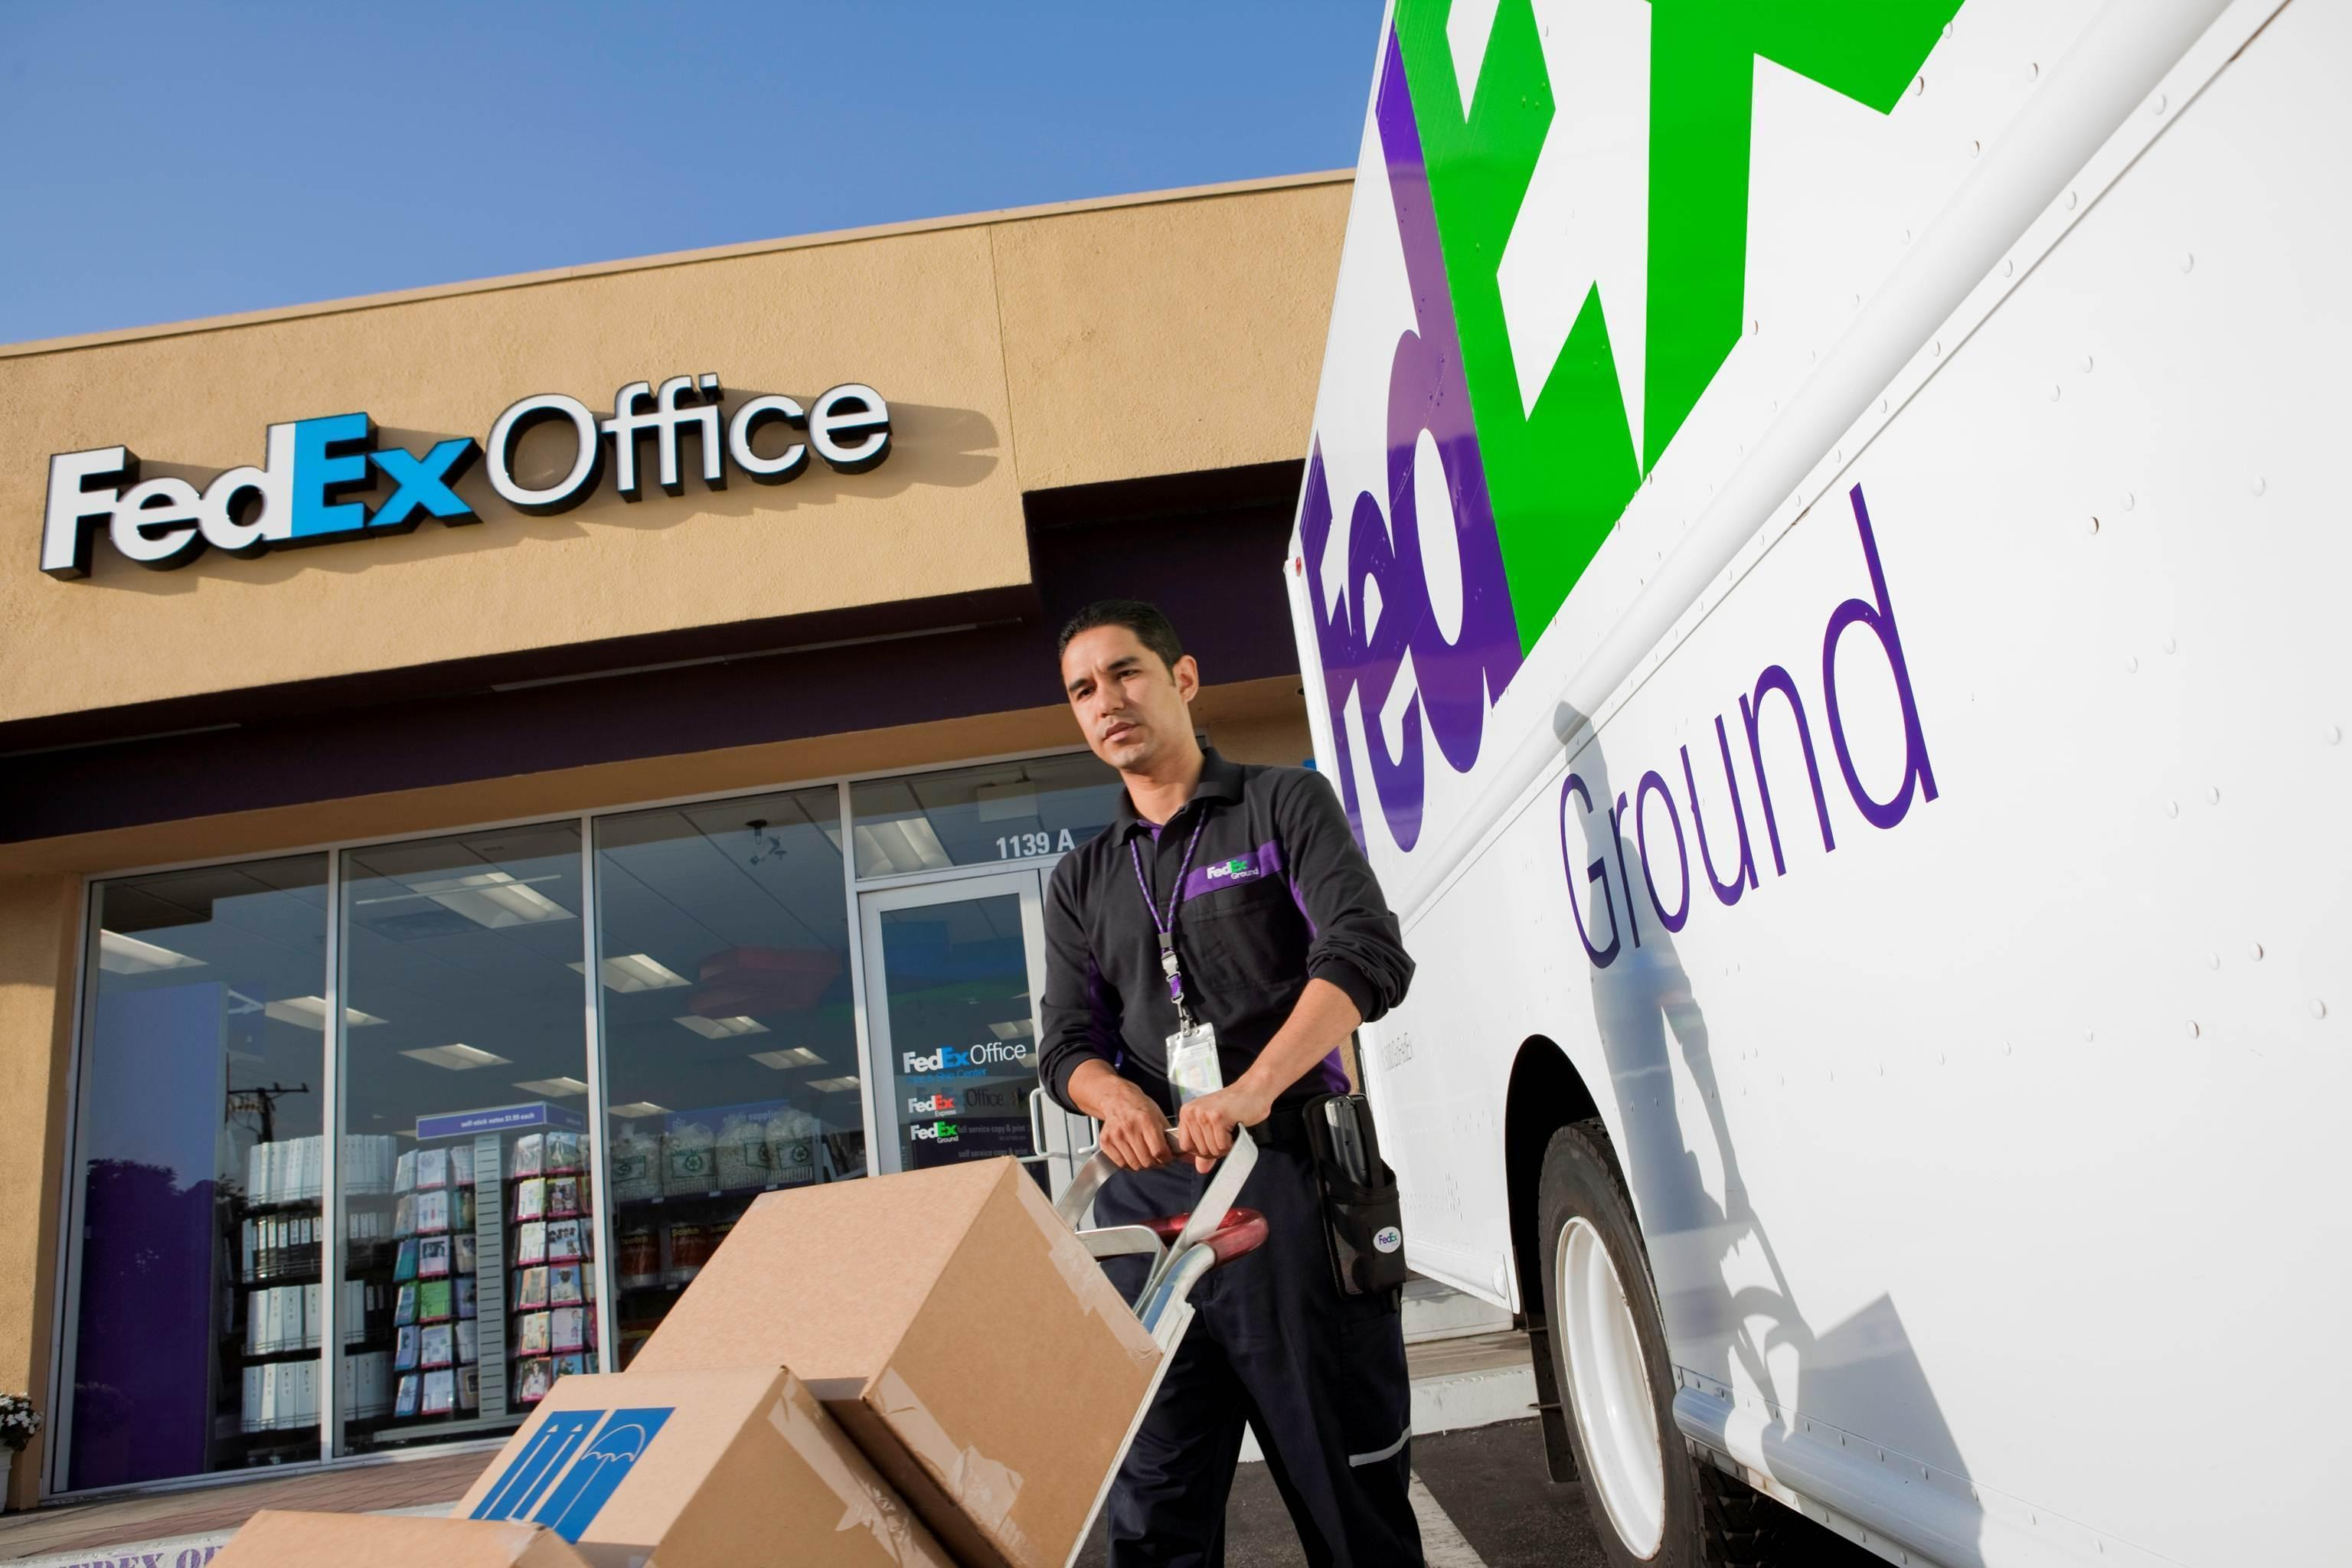 FedEx Office Print & Ship Center 418 3rd St Ste 5a, Fairbanks, AK ...